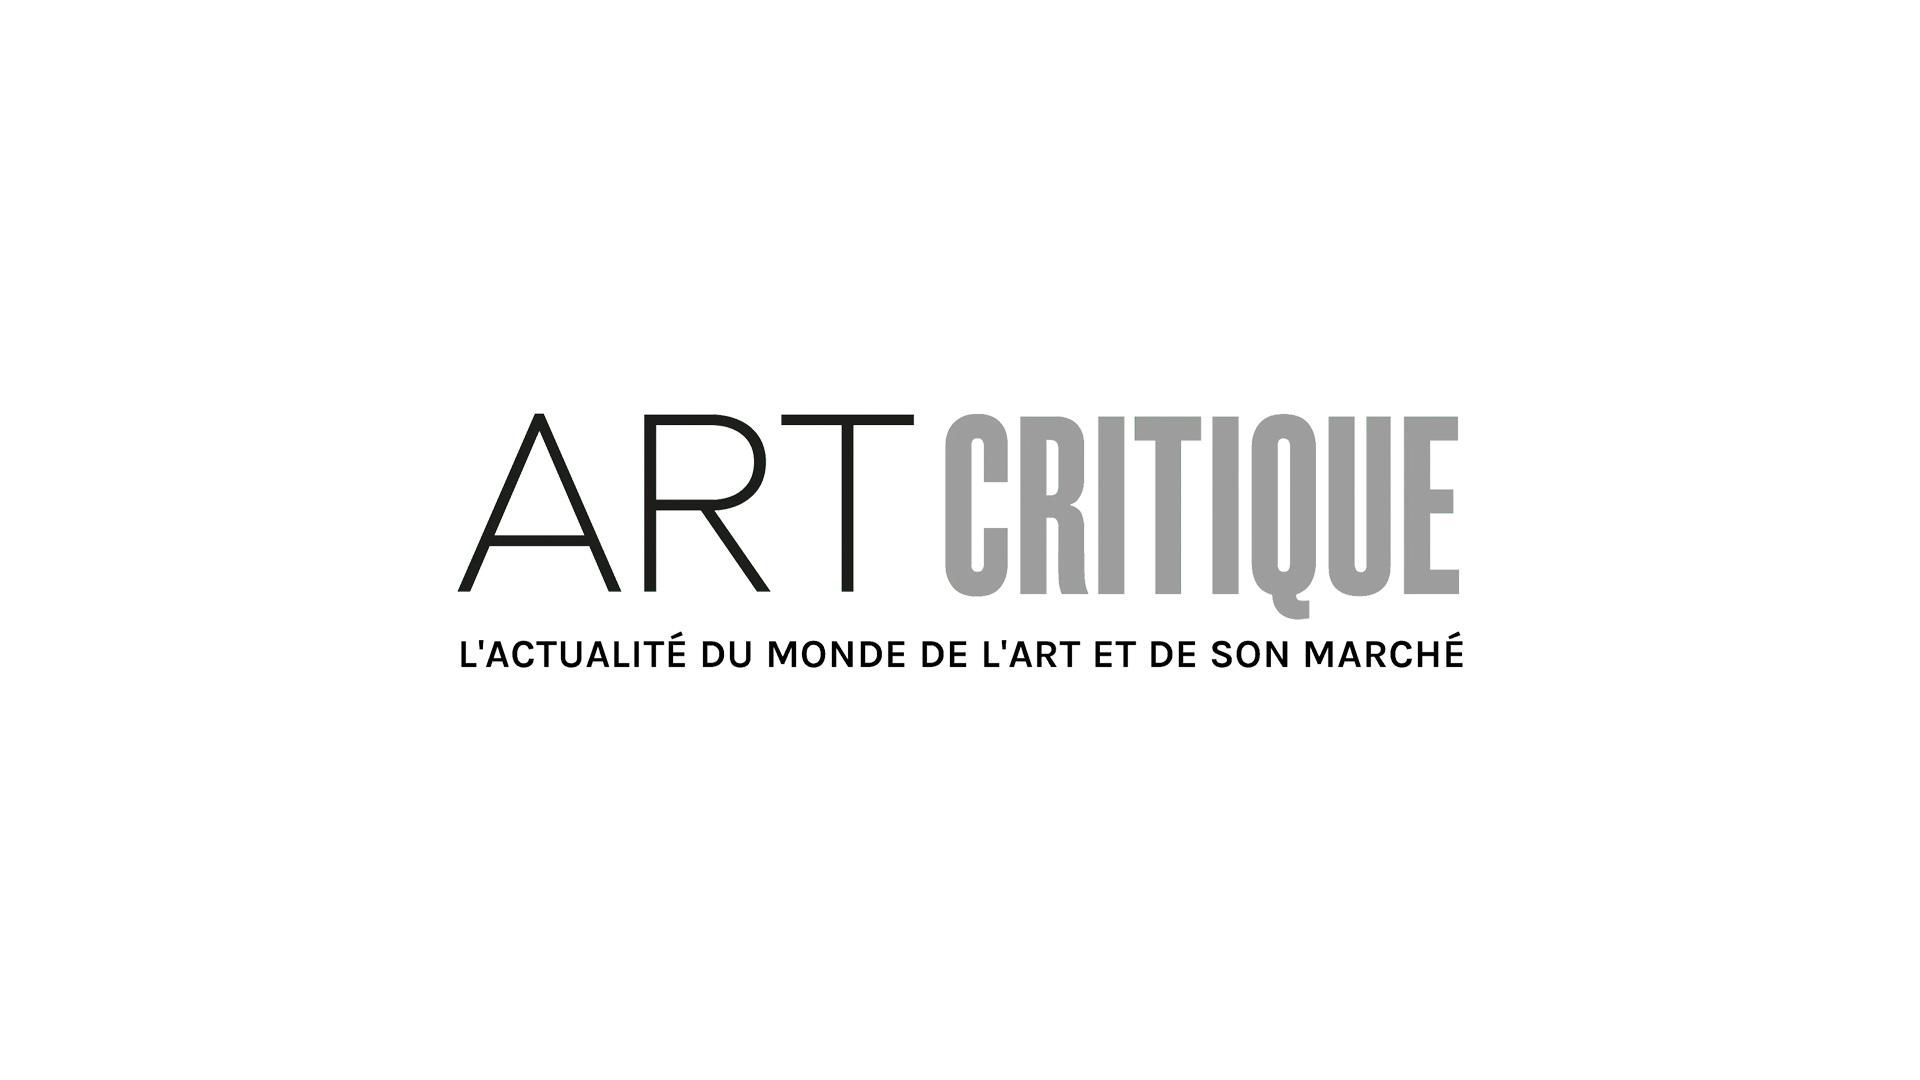 La collection d'Helena Rubinstein s'expose Quai Branly